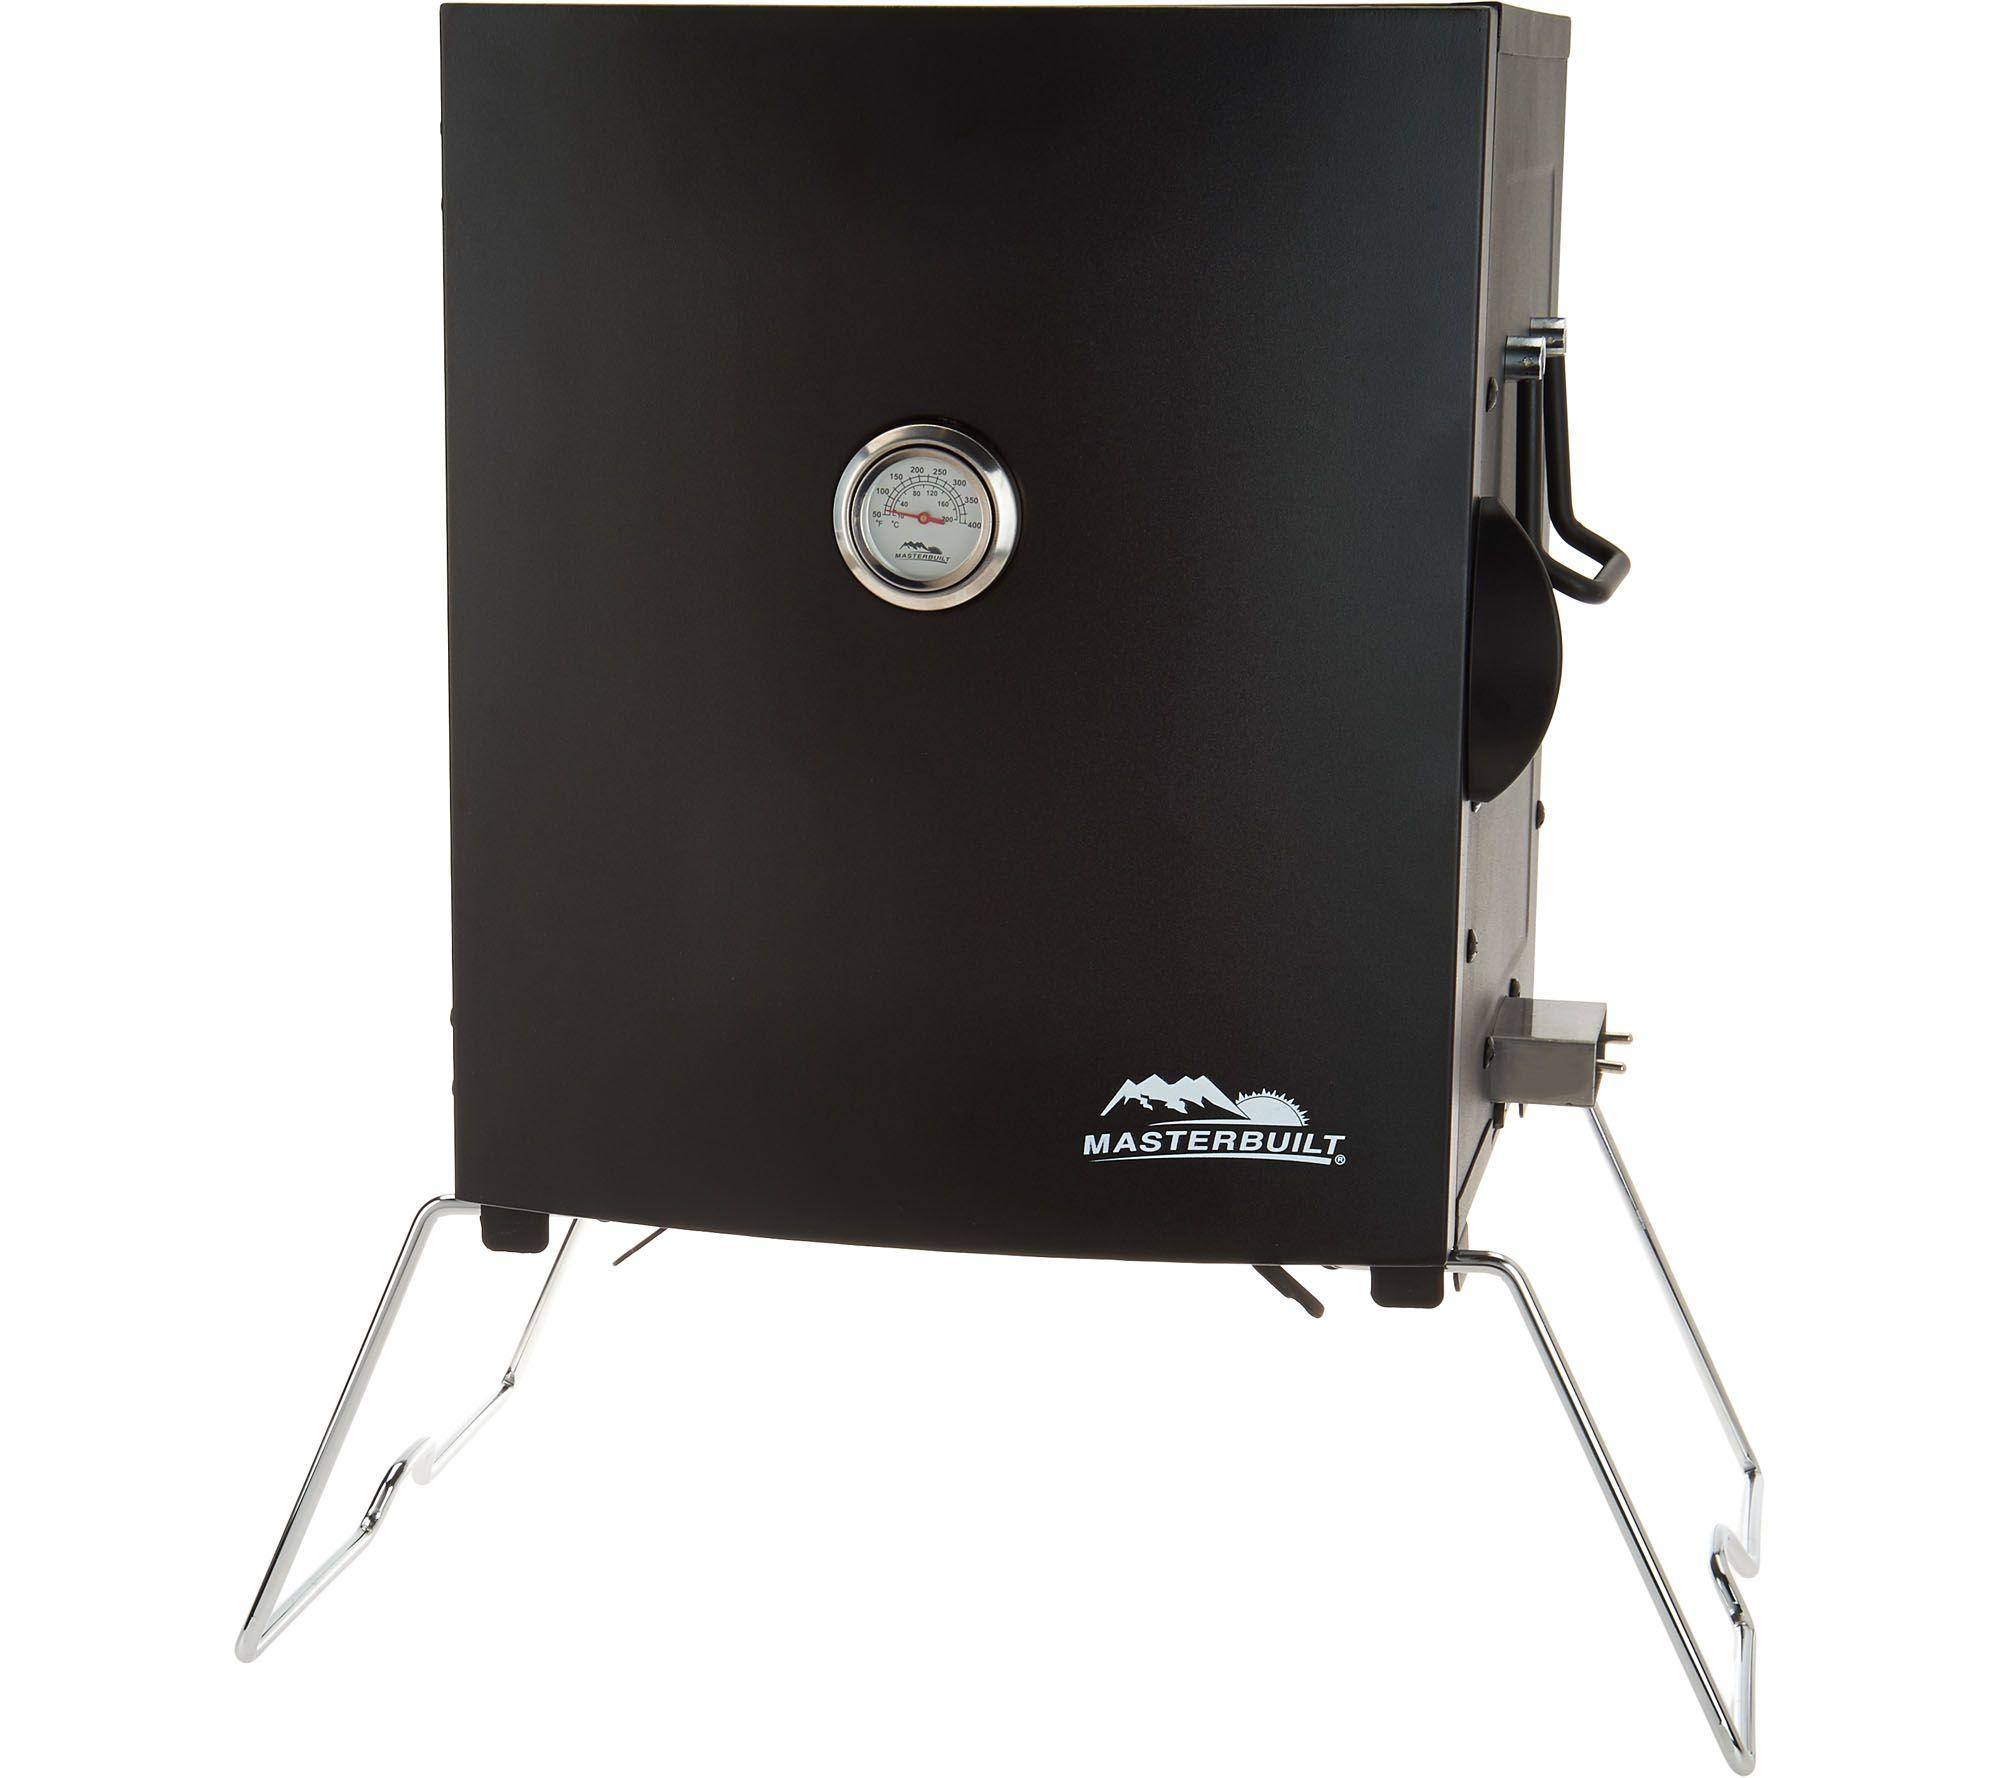 Masterbuilt 2 Rack Patio Portable Electric Smoker With Rib